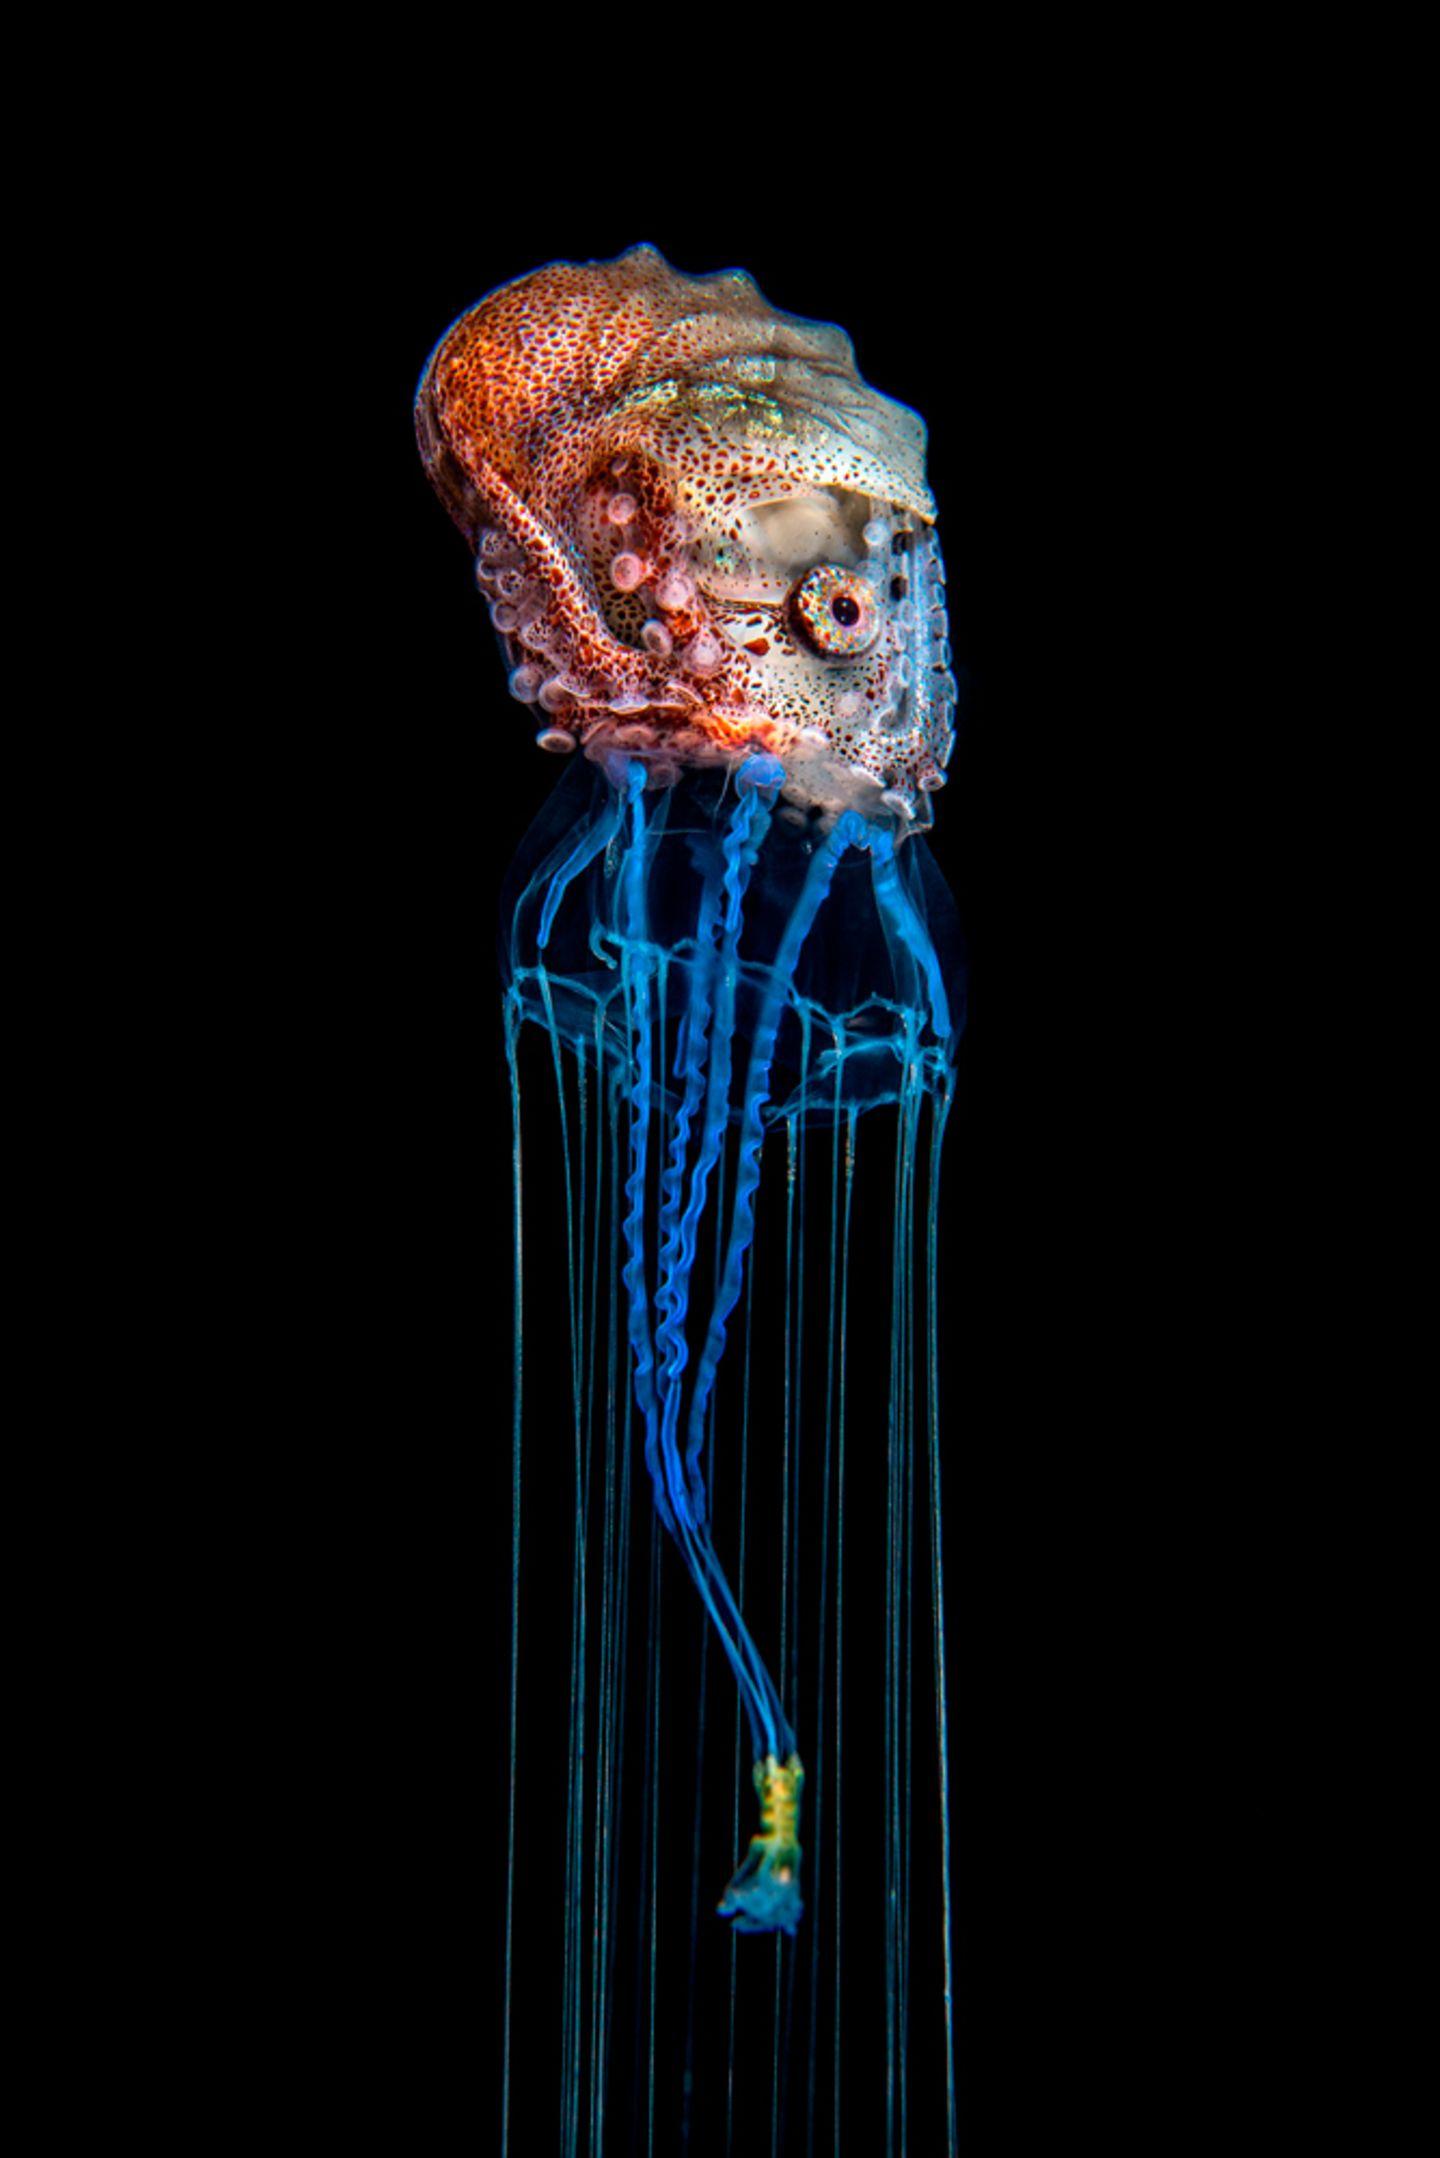 Magnus Lundgren/Nature inFocus Photograph of the Year